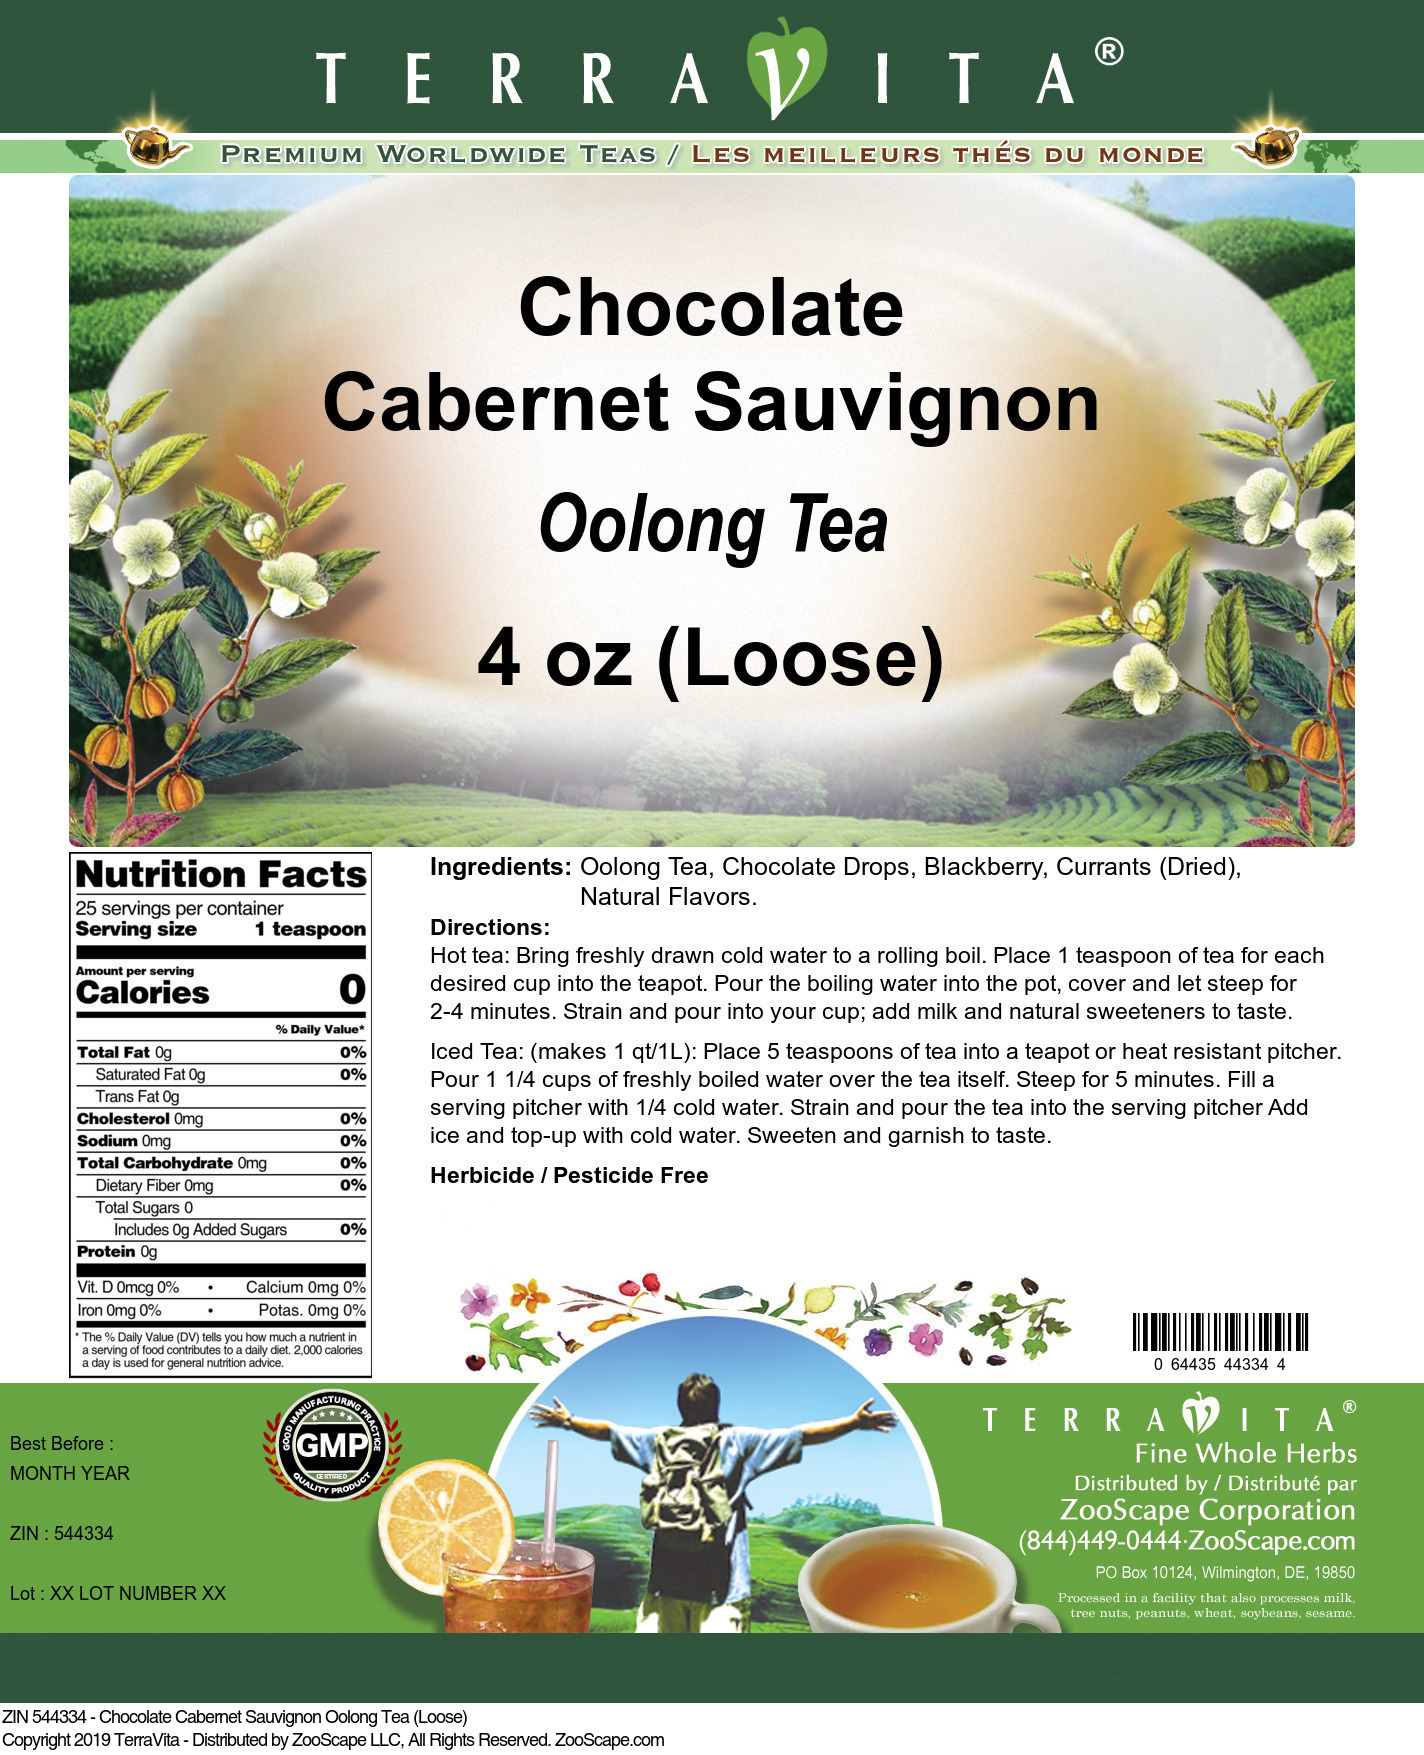 Chocolate Cabernet Sauvignon Oolong Tea (Loose)